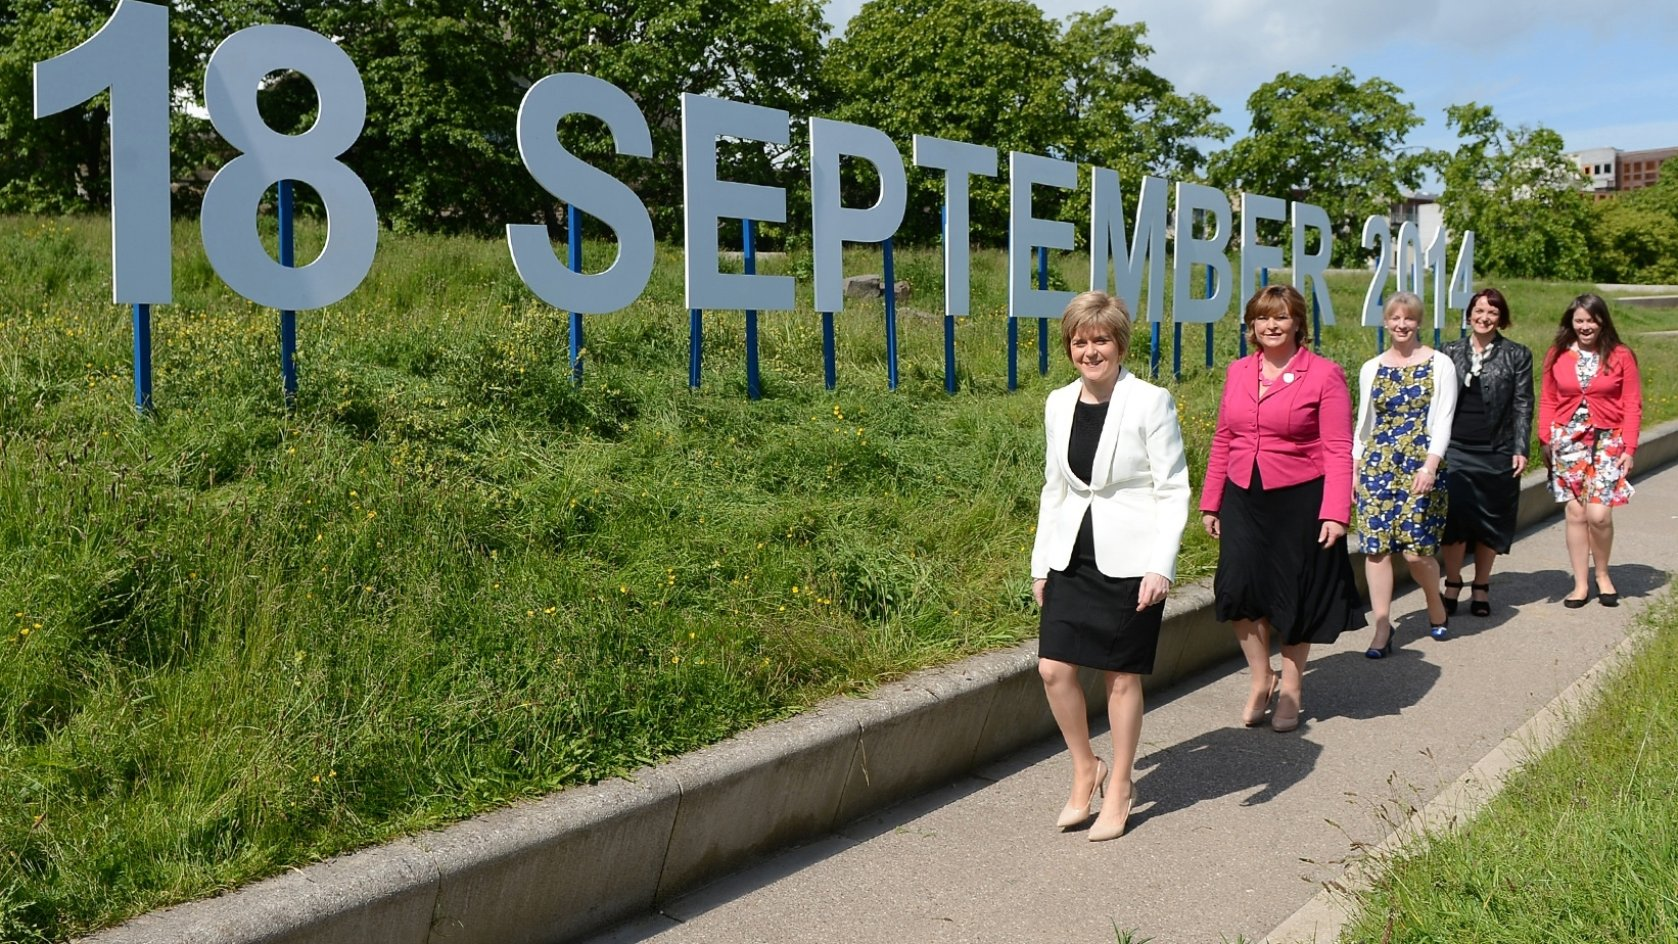 EDINBURGH, June 10, 2014 (Xinhua) -- Scottish Deputy First Minister Nicola Sturgeon (L) is seen in Edinburgh, Scotland, Britain, June 9, 2014.